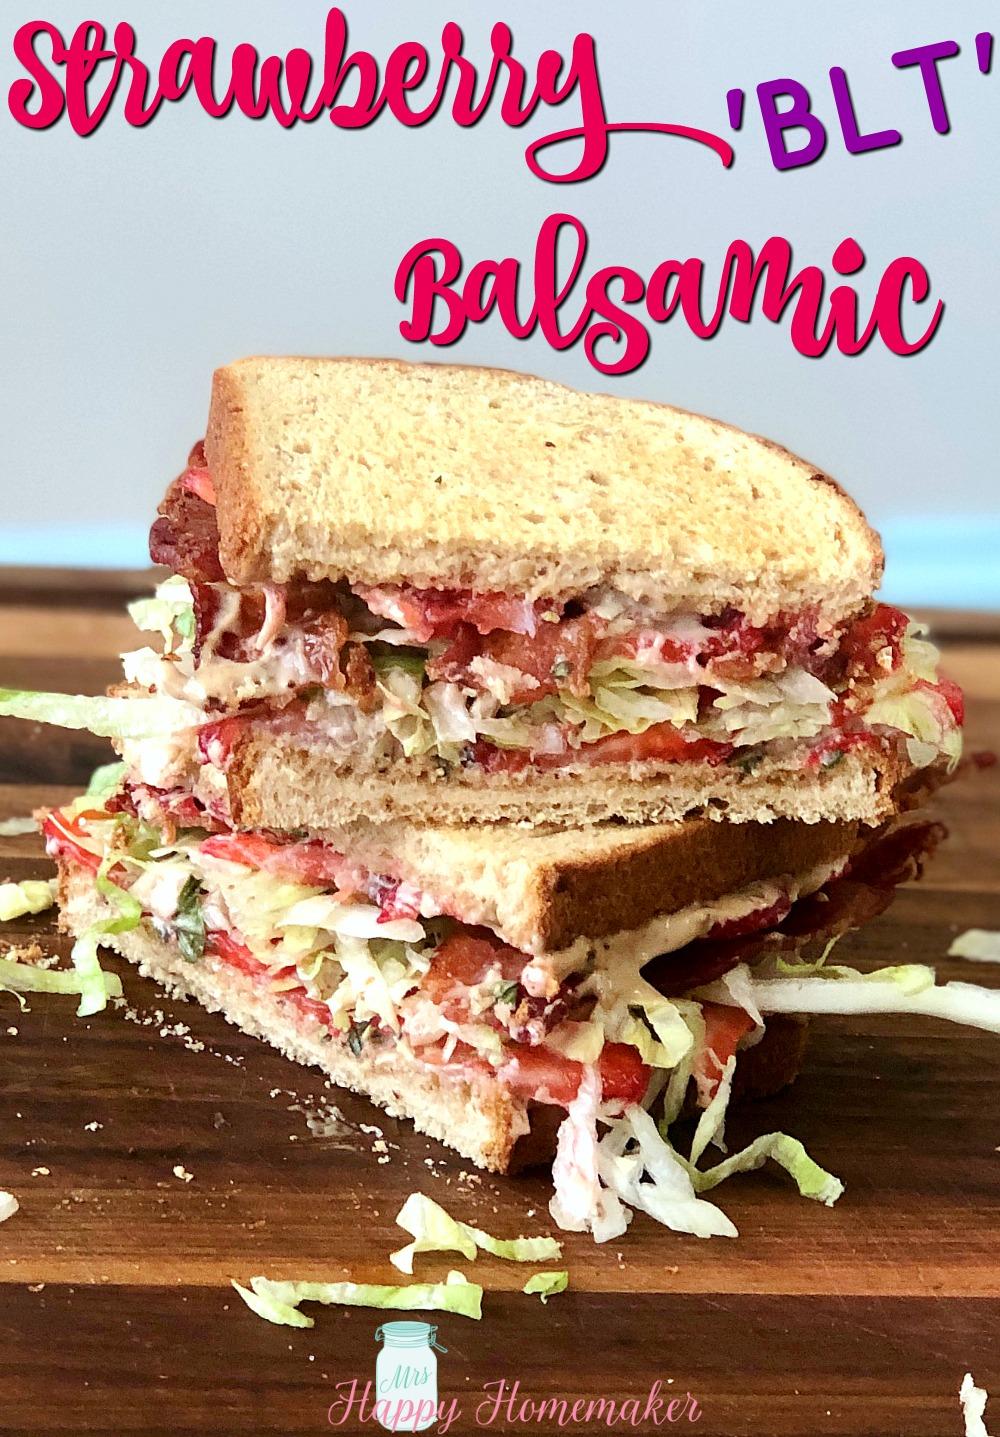 Strawberry Balsamic BLT Sandwich, sliced